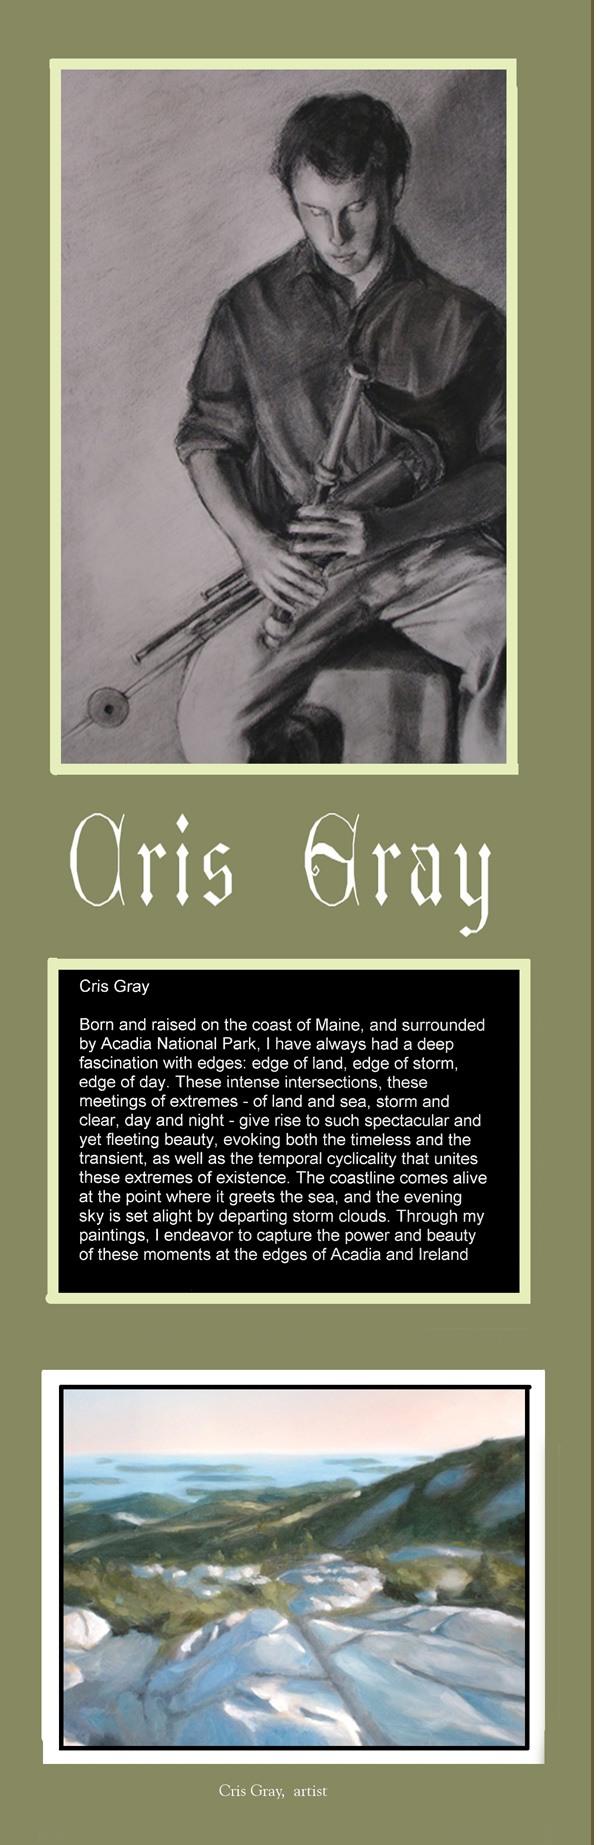 gray 2013